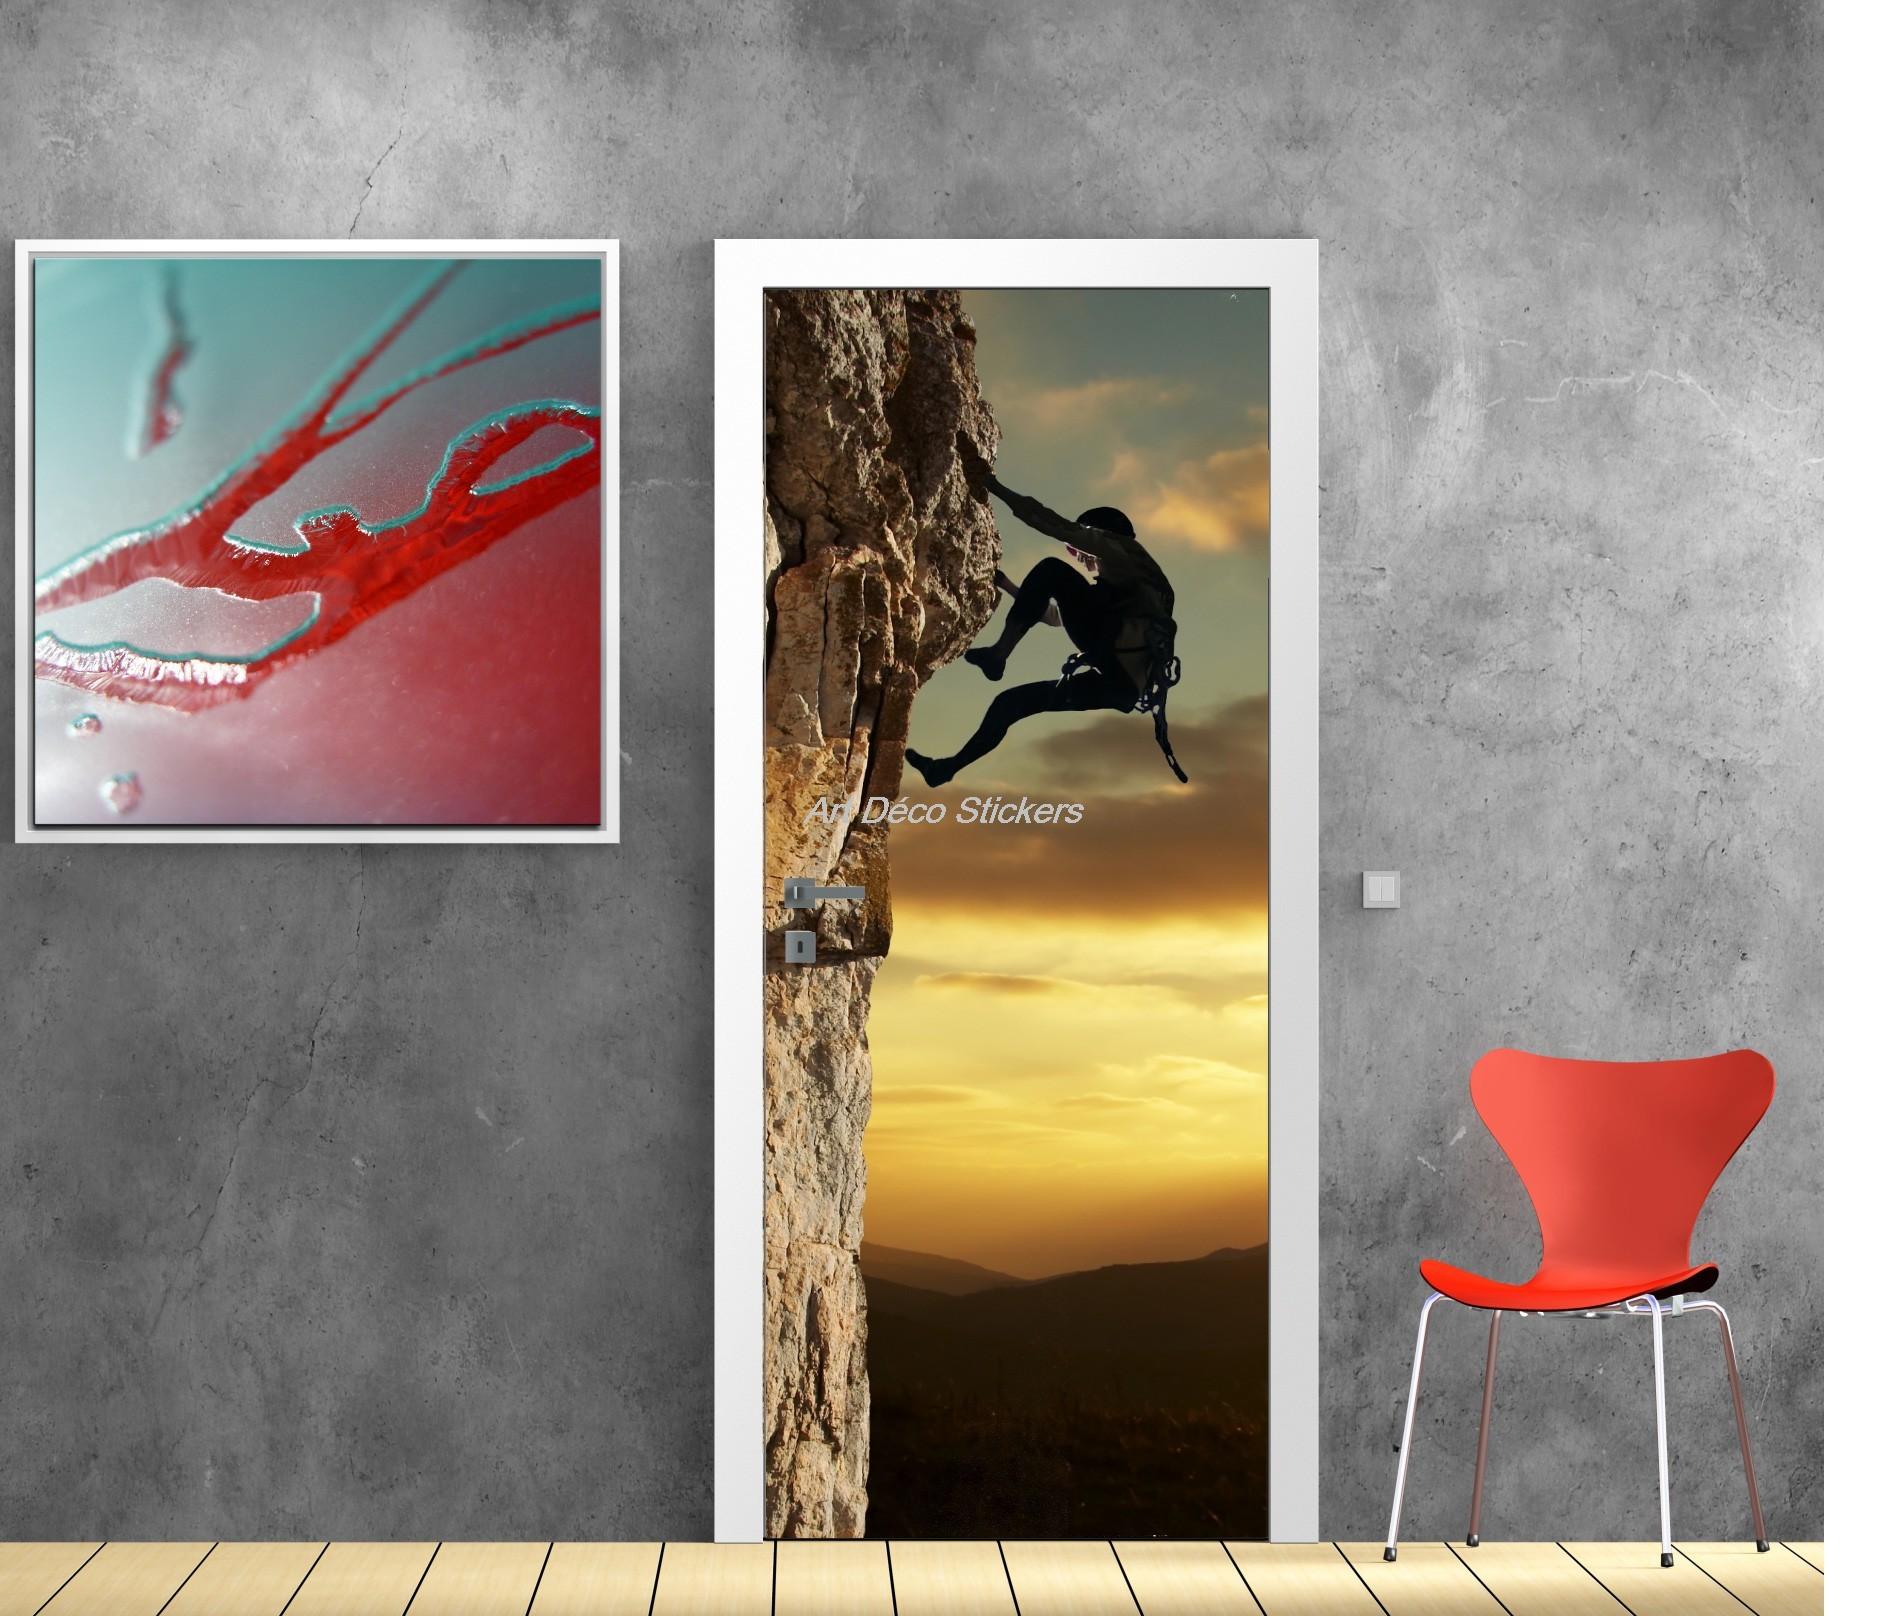 Poster mural trompe l oeil fashion designs - Poster trompe oeil mural ...